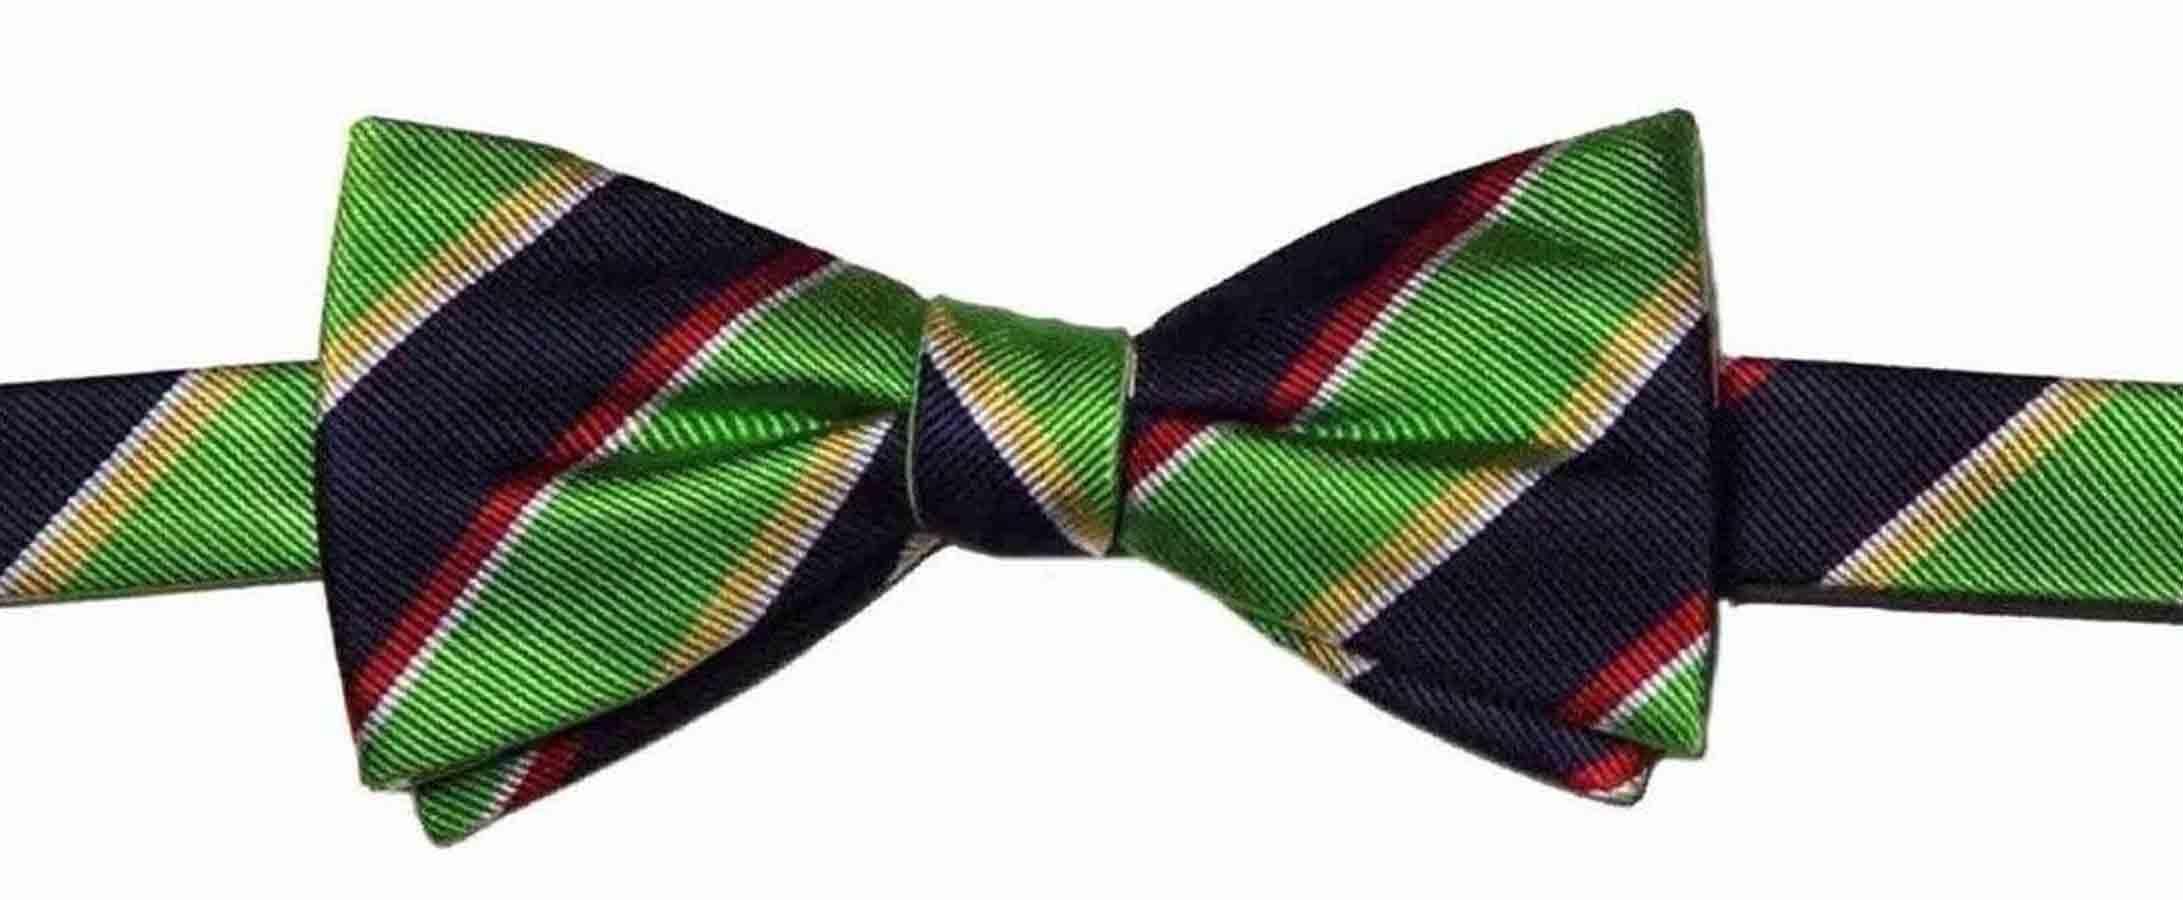 Countess Mara Regimental Stripe Bow Tie Green Red Blue Men's